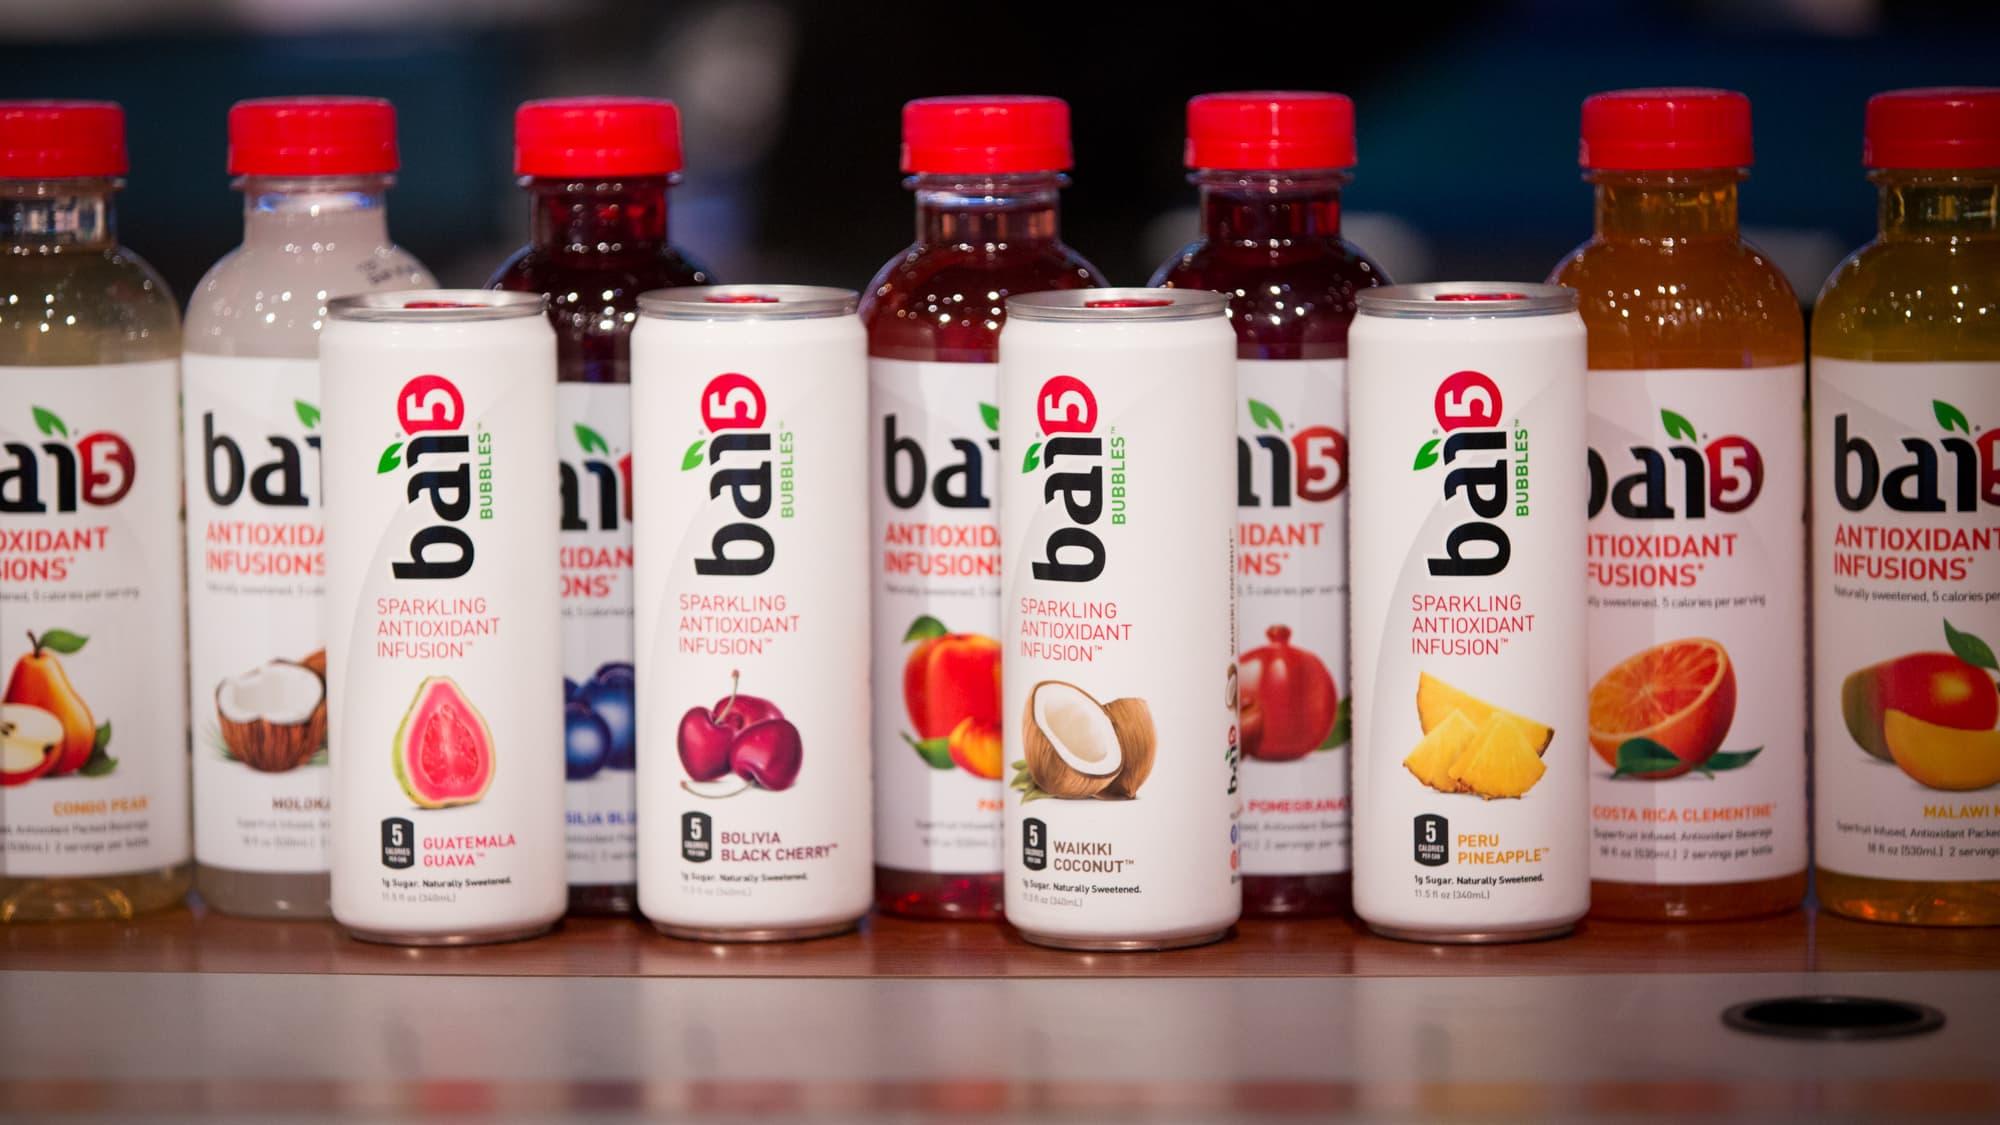 Dr Pepper Snapple Grows Bai Brands Antioxidant Drink